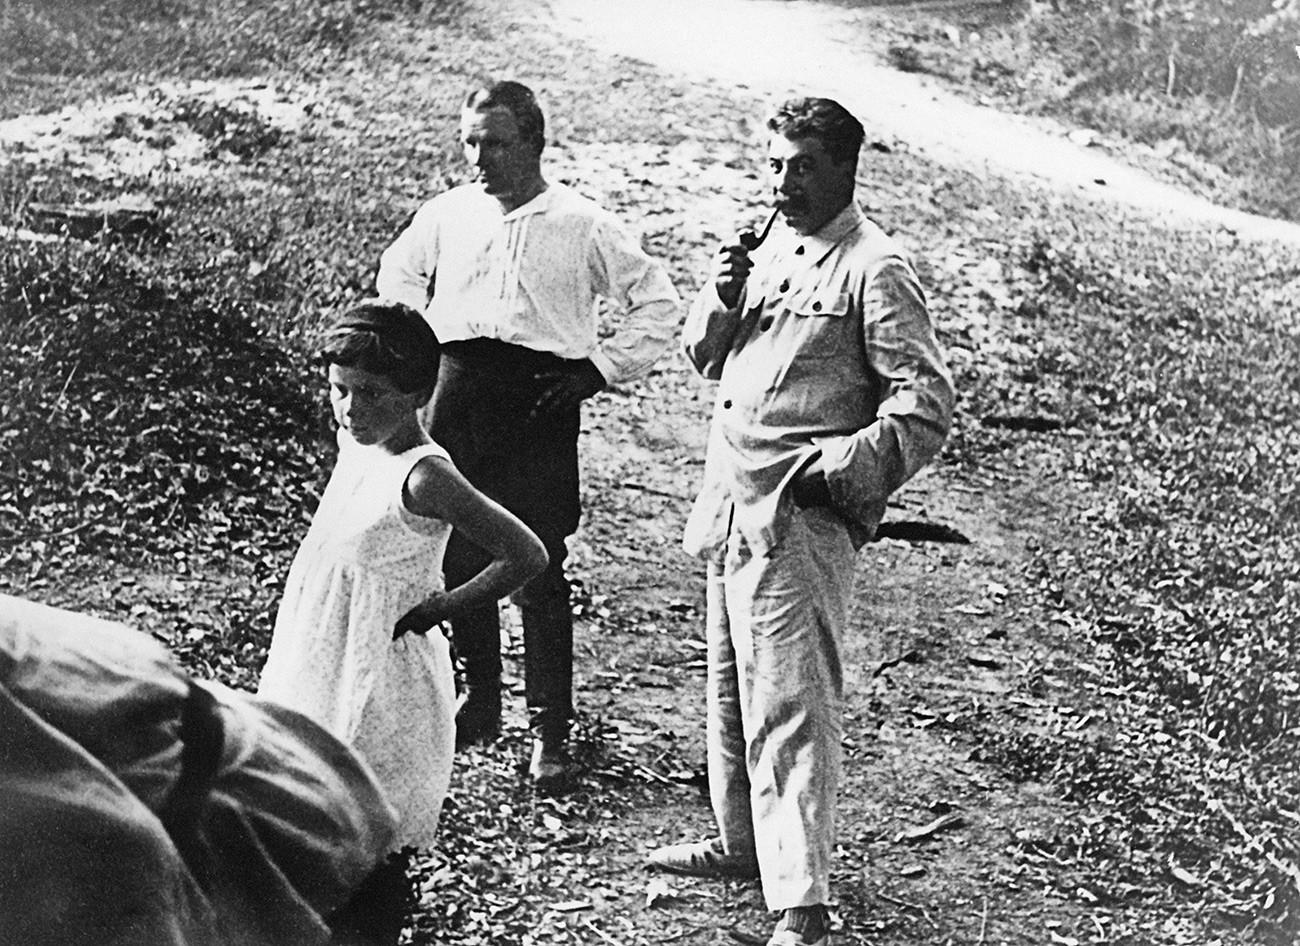 Sergei Kirov, Joseph Stalin, and his daughter Svetlana. 1930s. From the personal archive of Elena Kovalenko.